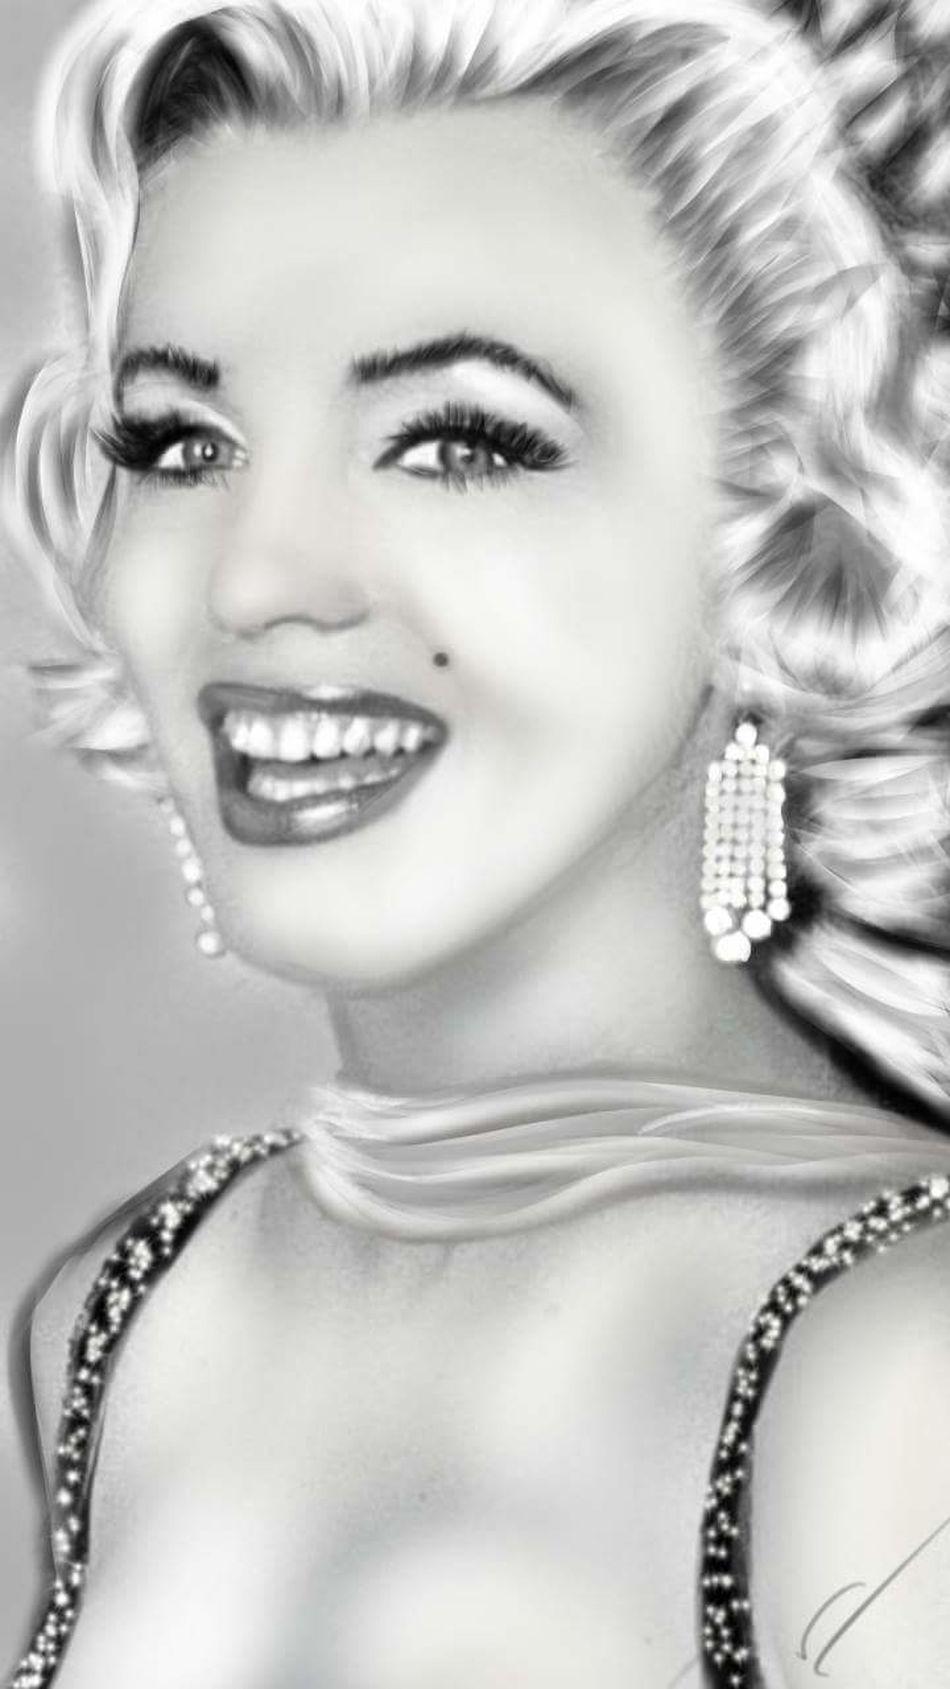 Digital art drawn by me One Woman Only Beauty Beautiful Woman Portrait Human Face Digital Eye Masters Digital Painting Digital Art Digitalartwork Marilyn Monroe <3 Portait EyeEm Gallery Real People Reflection Once Apon A Time Missyou